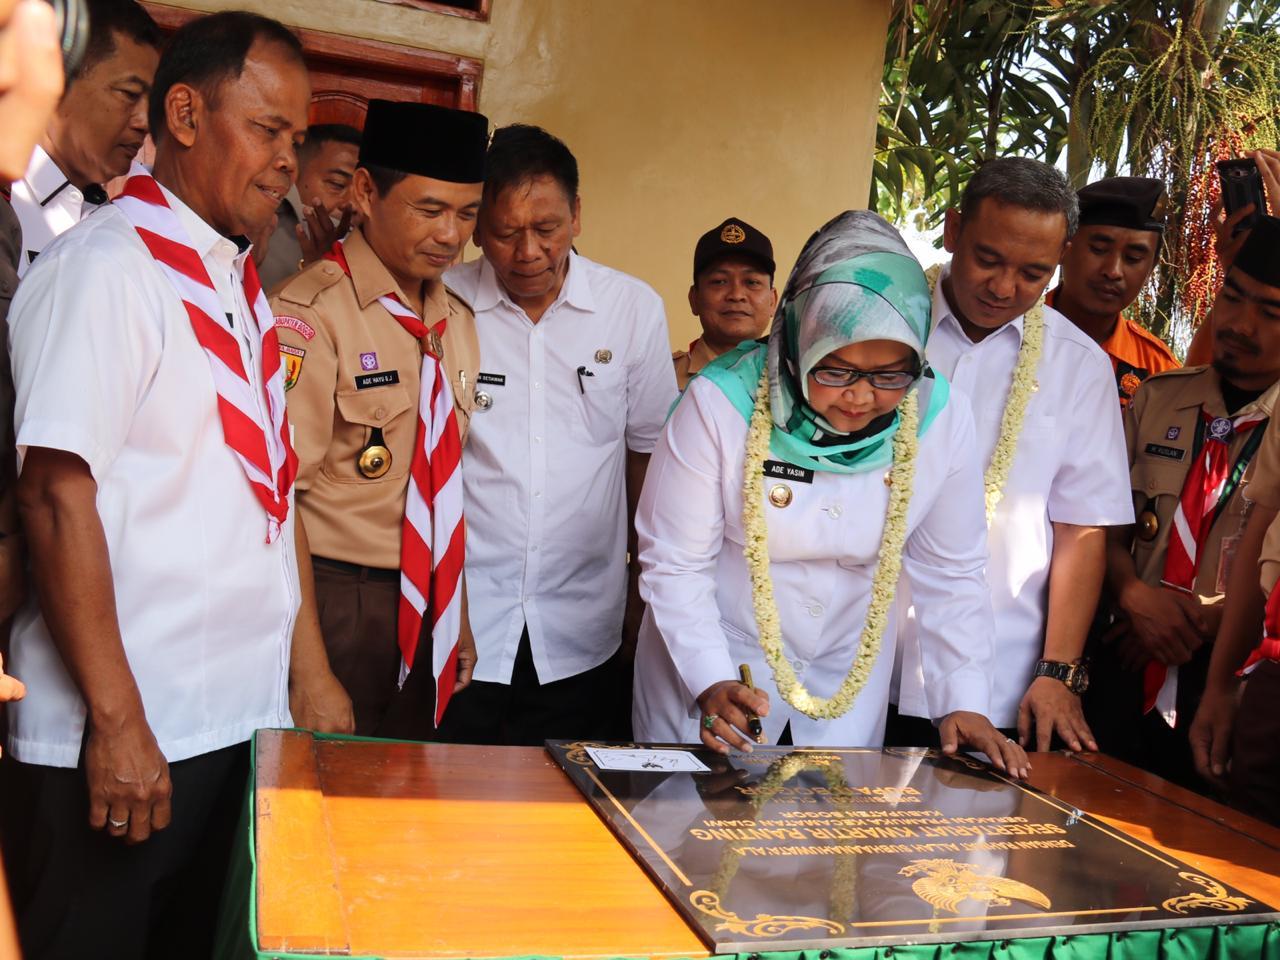 Boling di Kecamatan Ciawi, Bupati Bogor Berikan Secara Simbolis 500 KTP Elektronik Yang Sudah Jadi